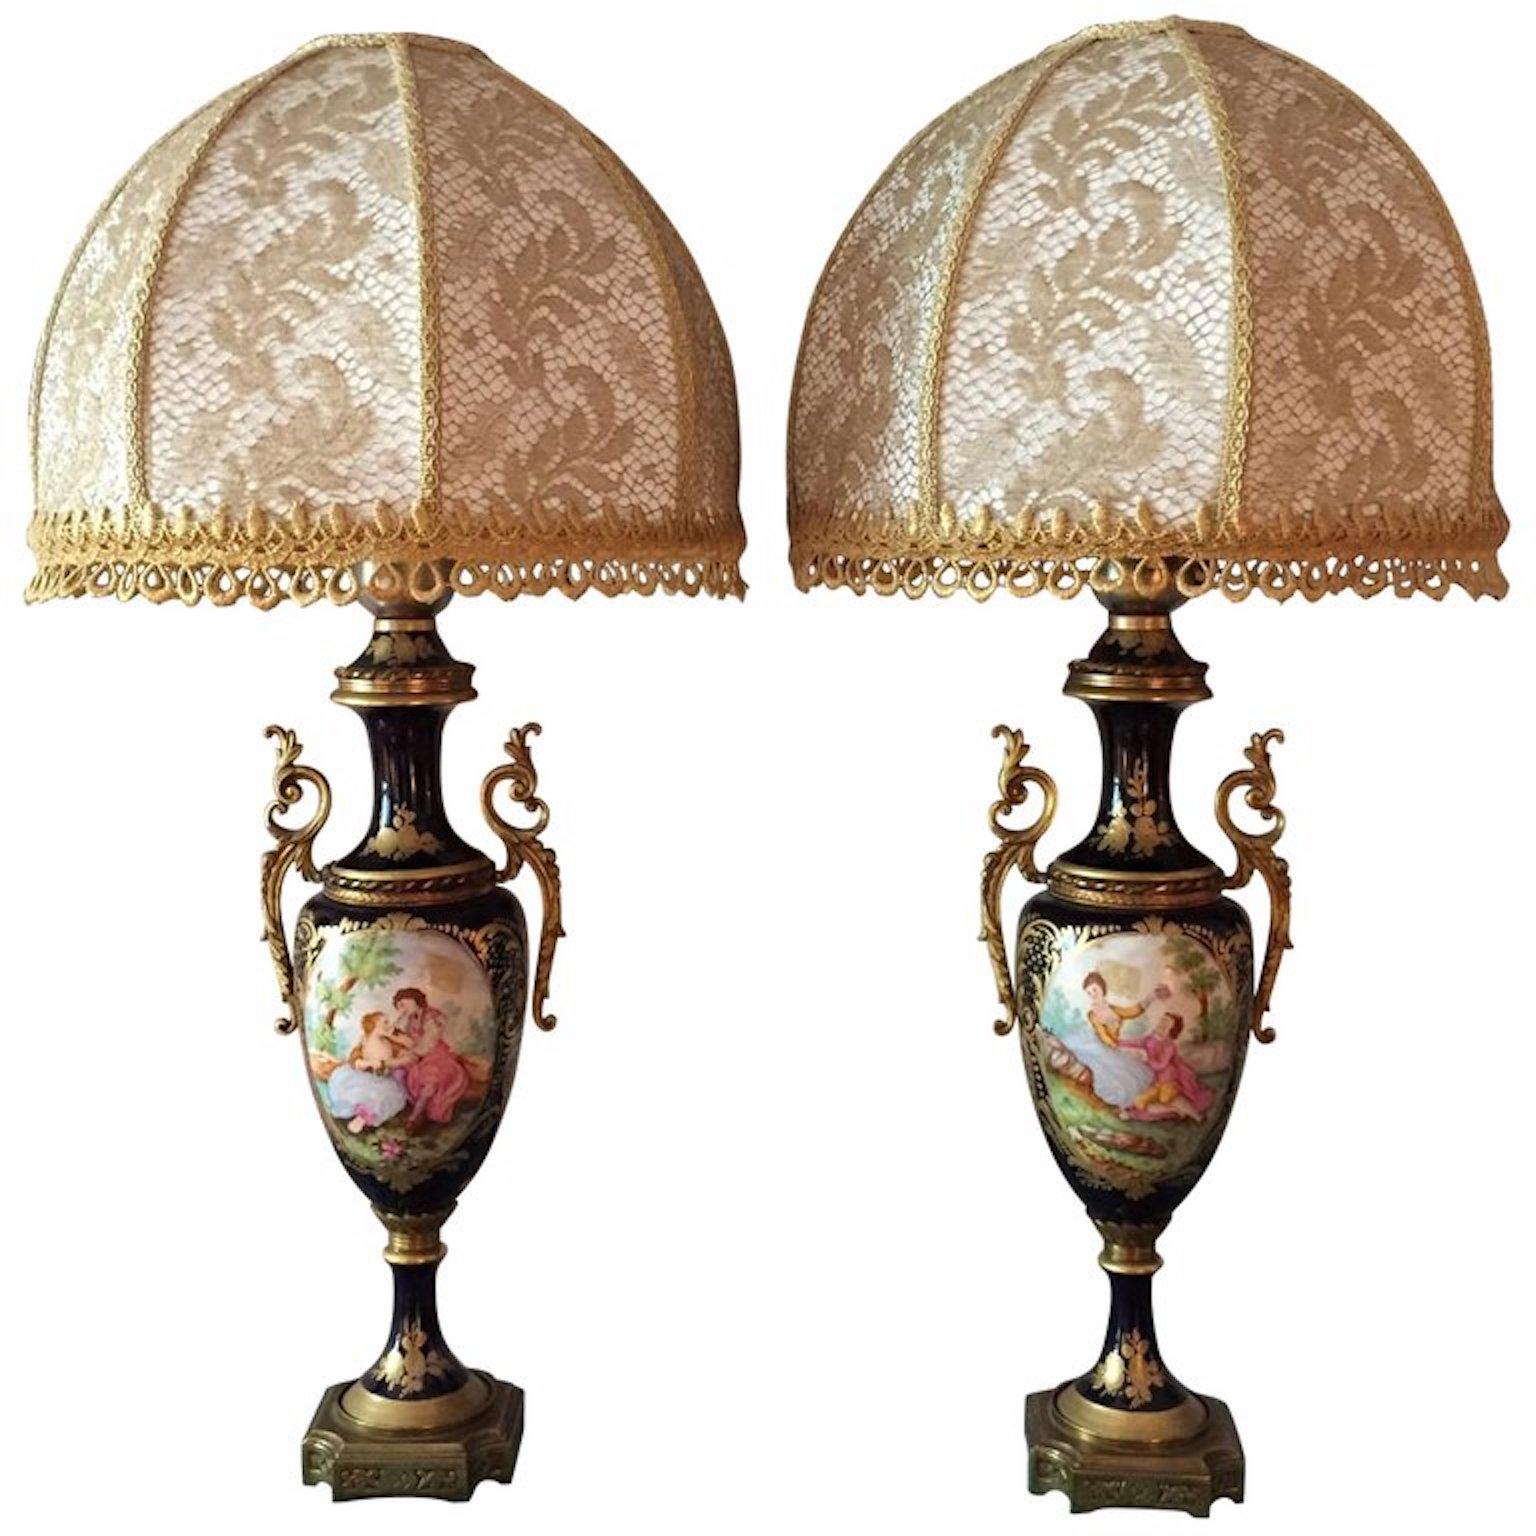 coppia di lampade in porcellana stile francese